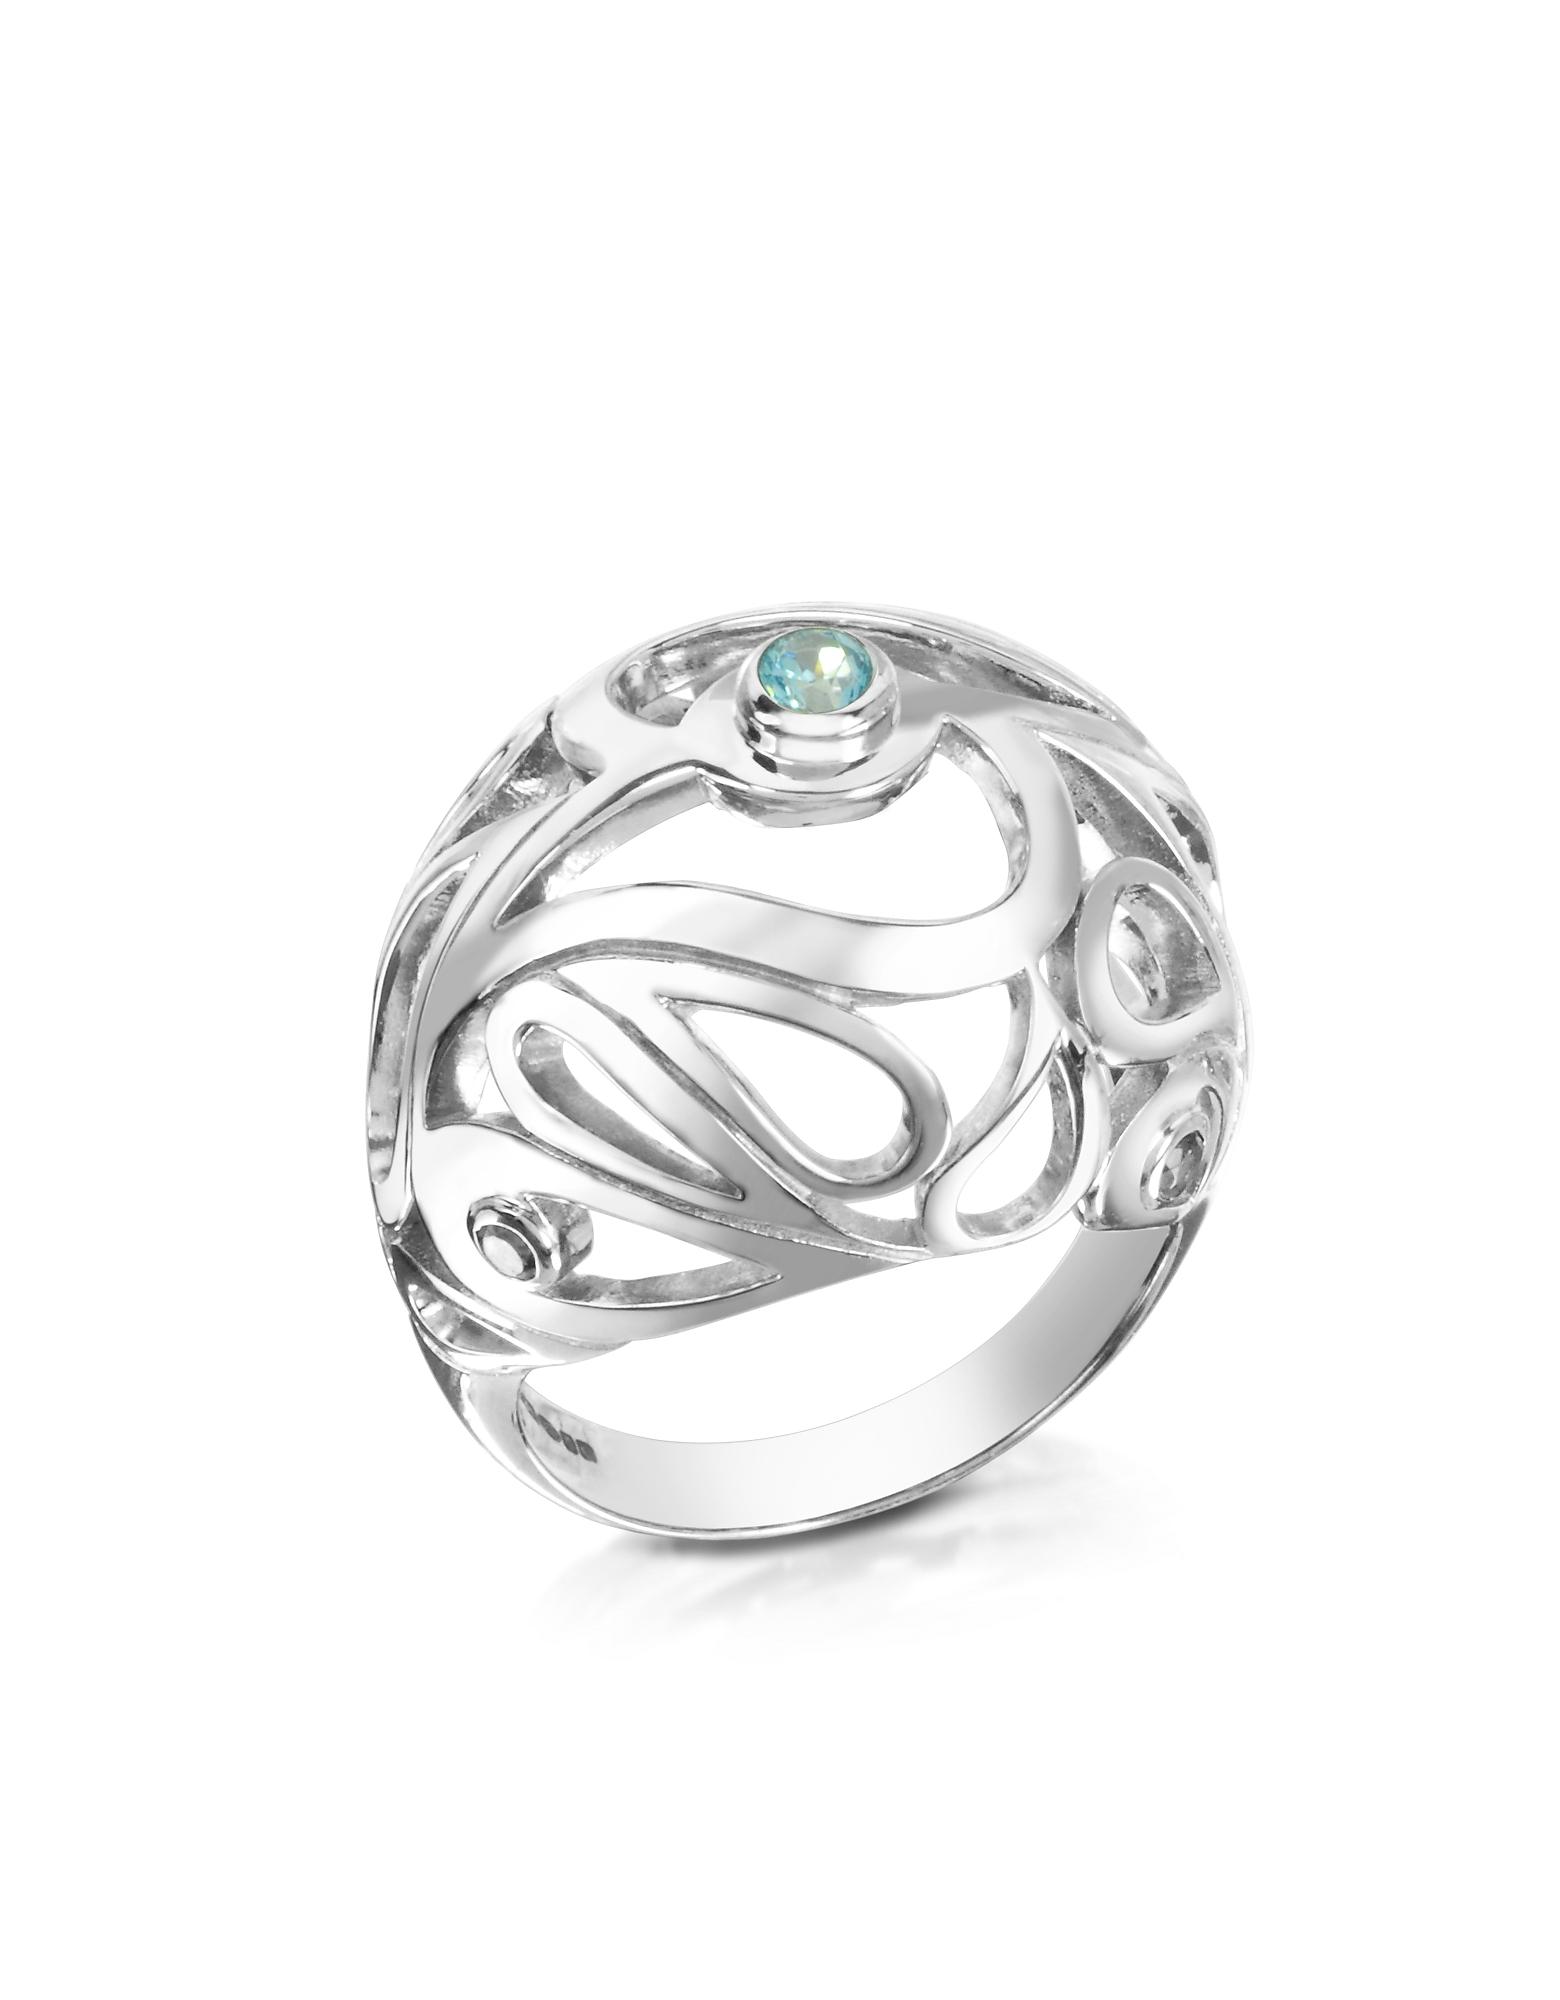 Sho London Rings, Sterling Silver Mari Splash Boule Ring